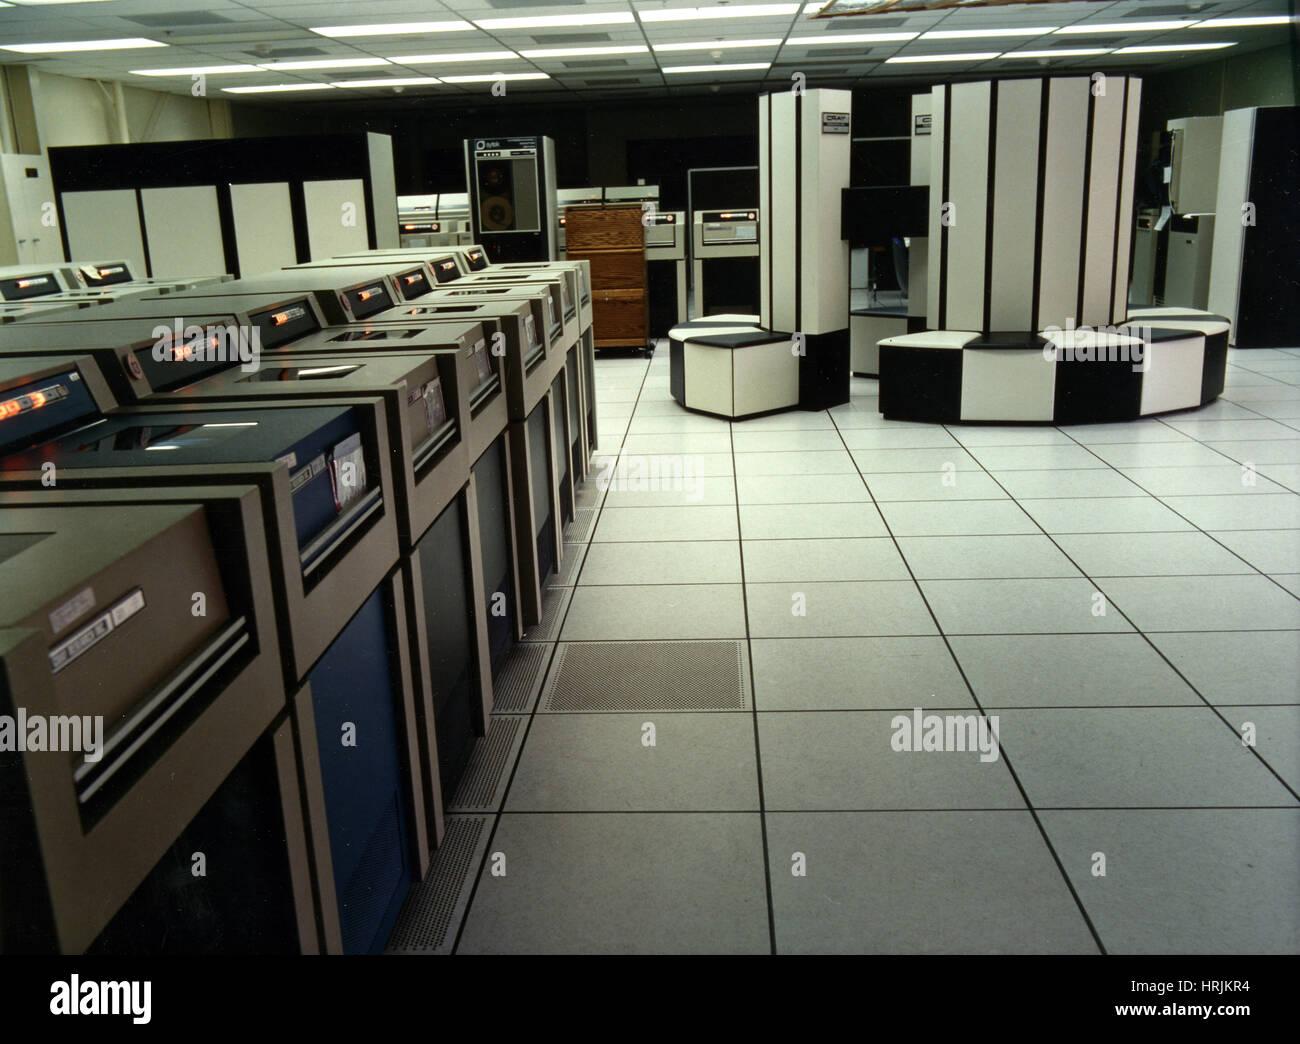 Cray-X MP/48 Supercomputer, LLNL, 1980s - Stock Image